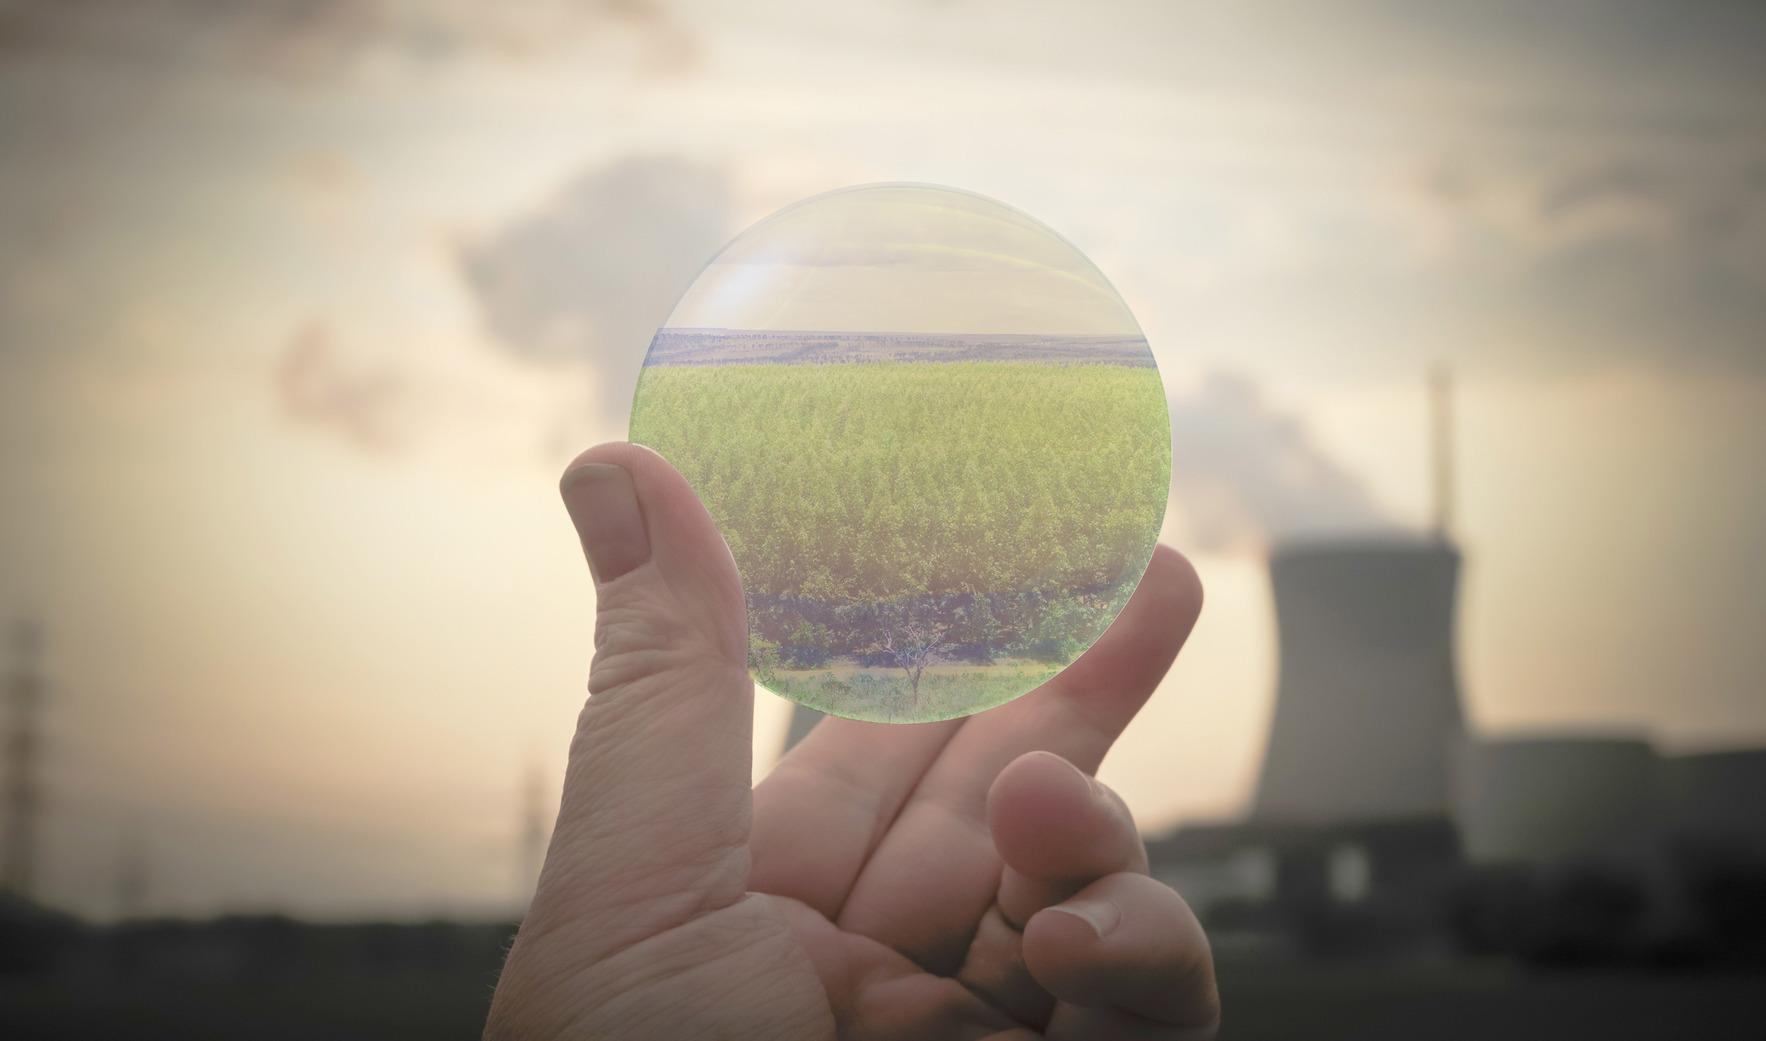 Carbon capture, utilization, and storage